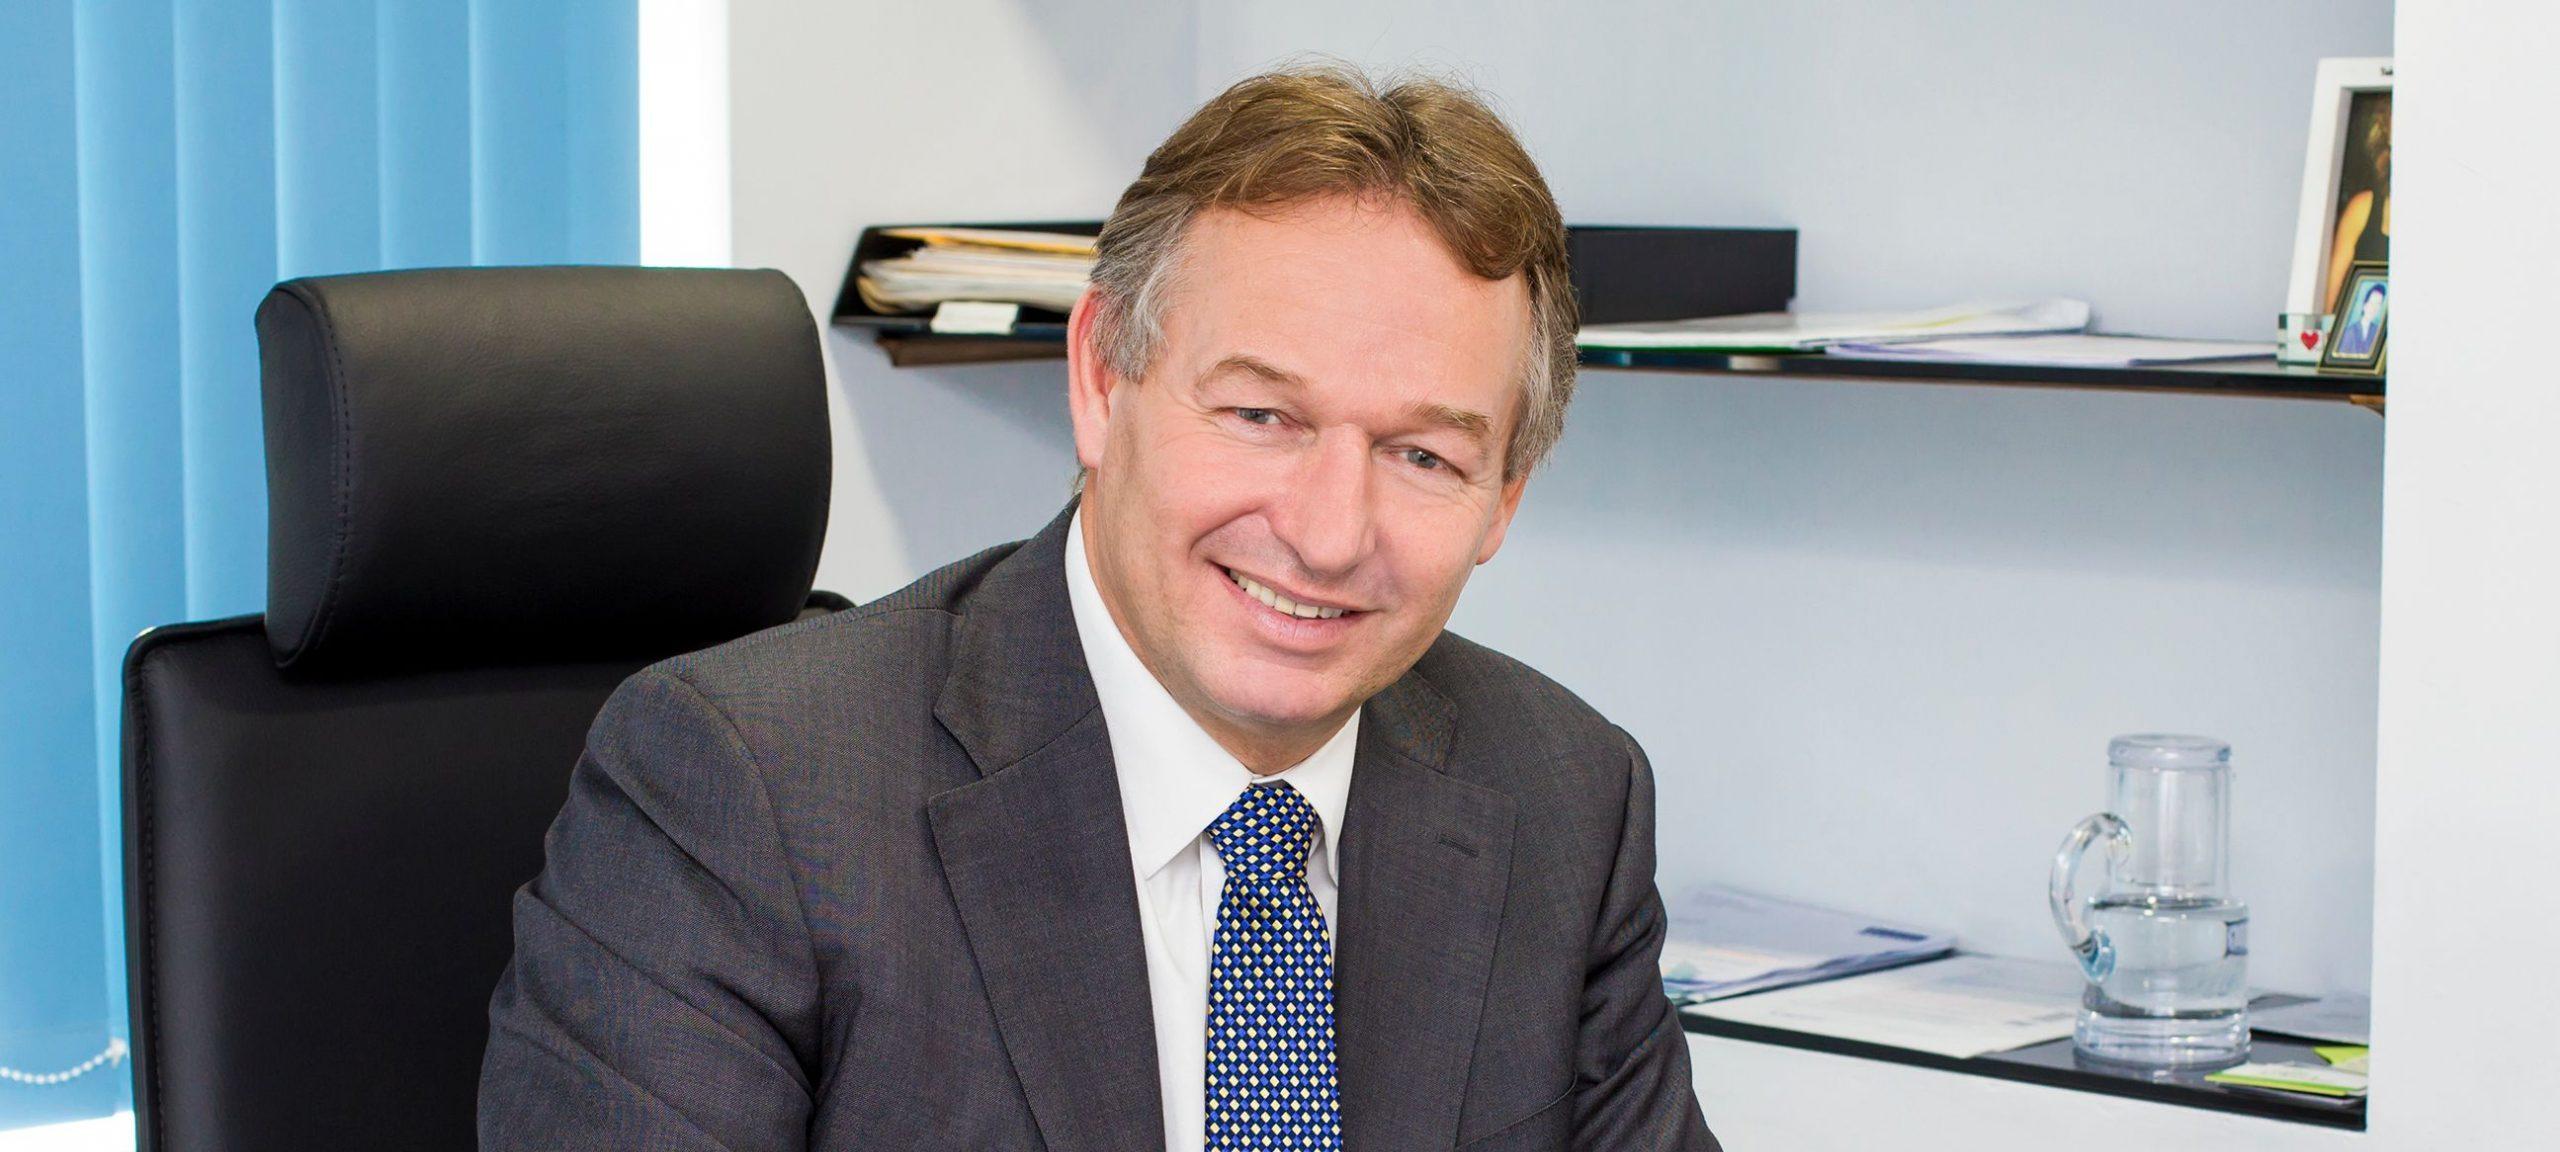 Swiftclean's Gary Nicholls named Chairman of VHE scheme user group